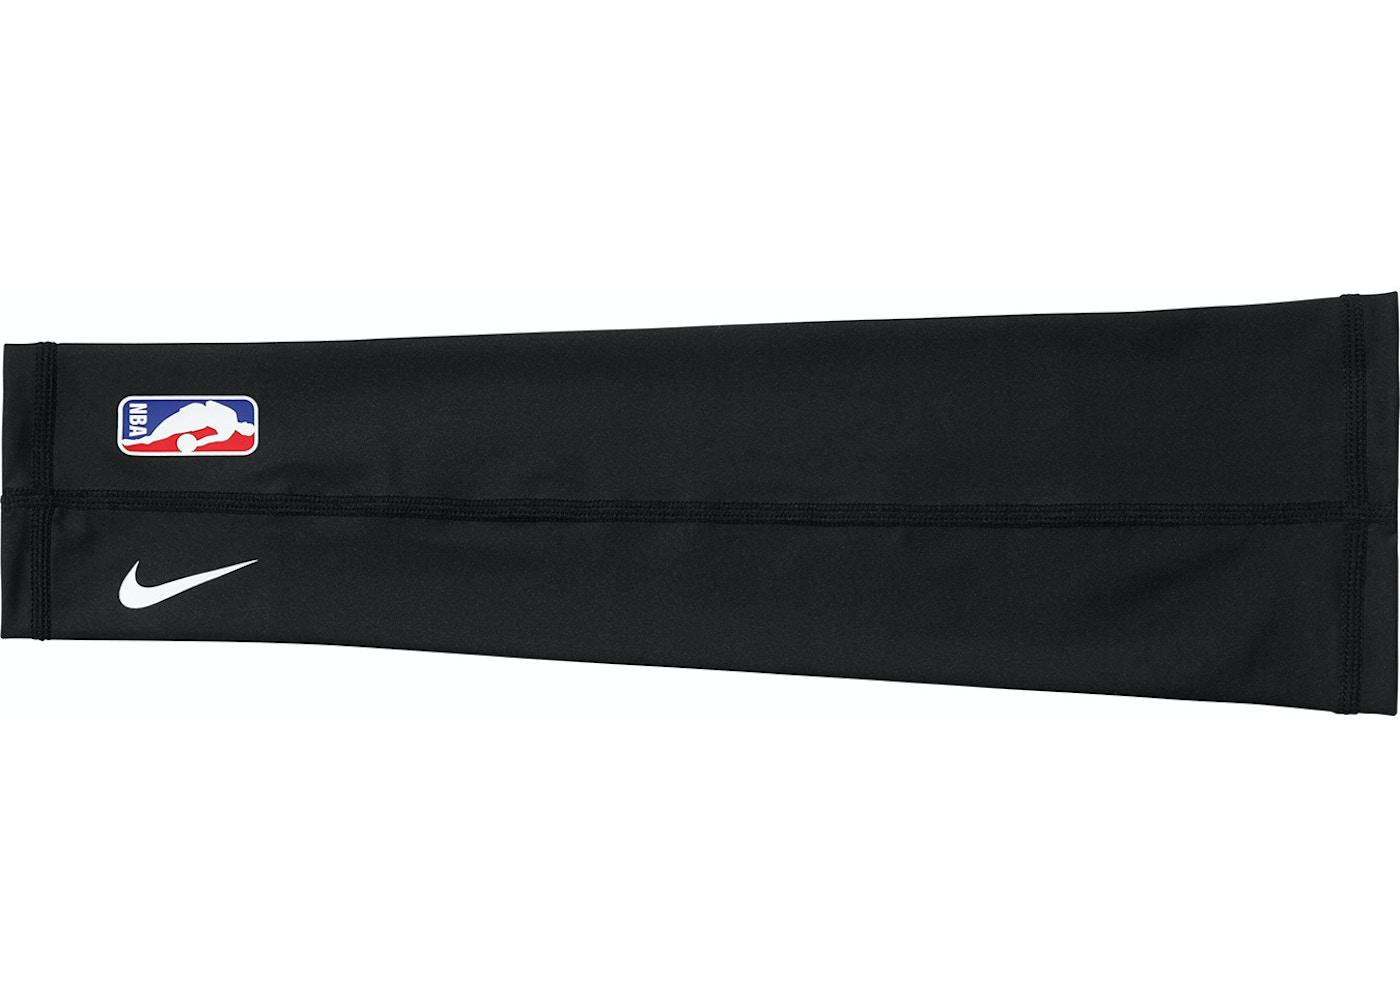 Supreme Nike NBA Shooting Sleeve 2 Pack Black